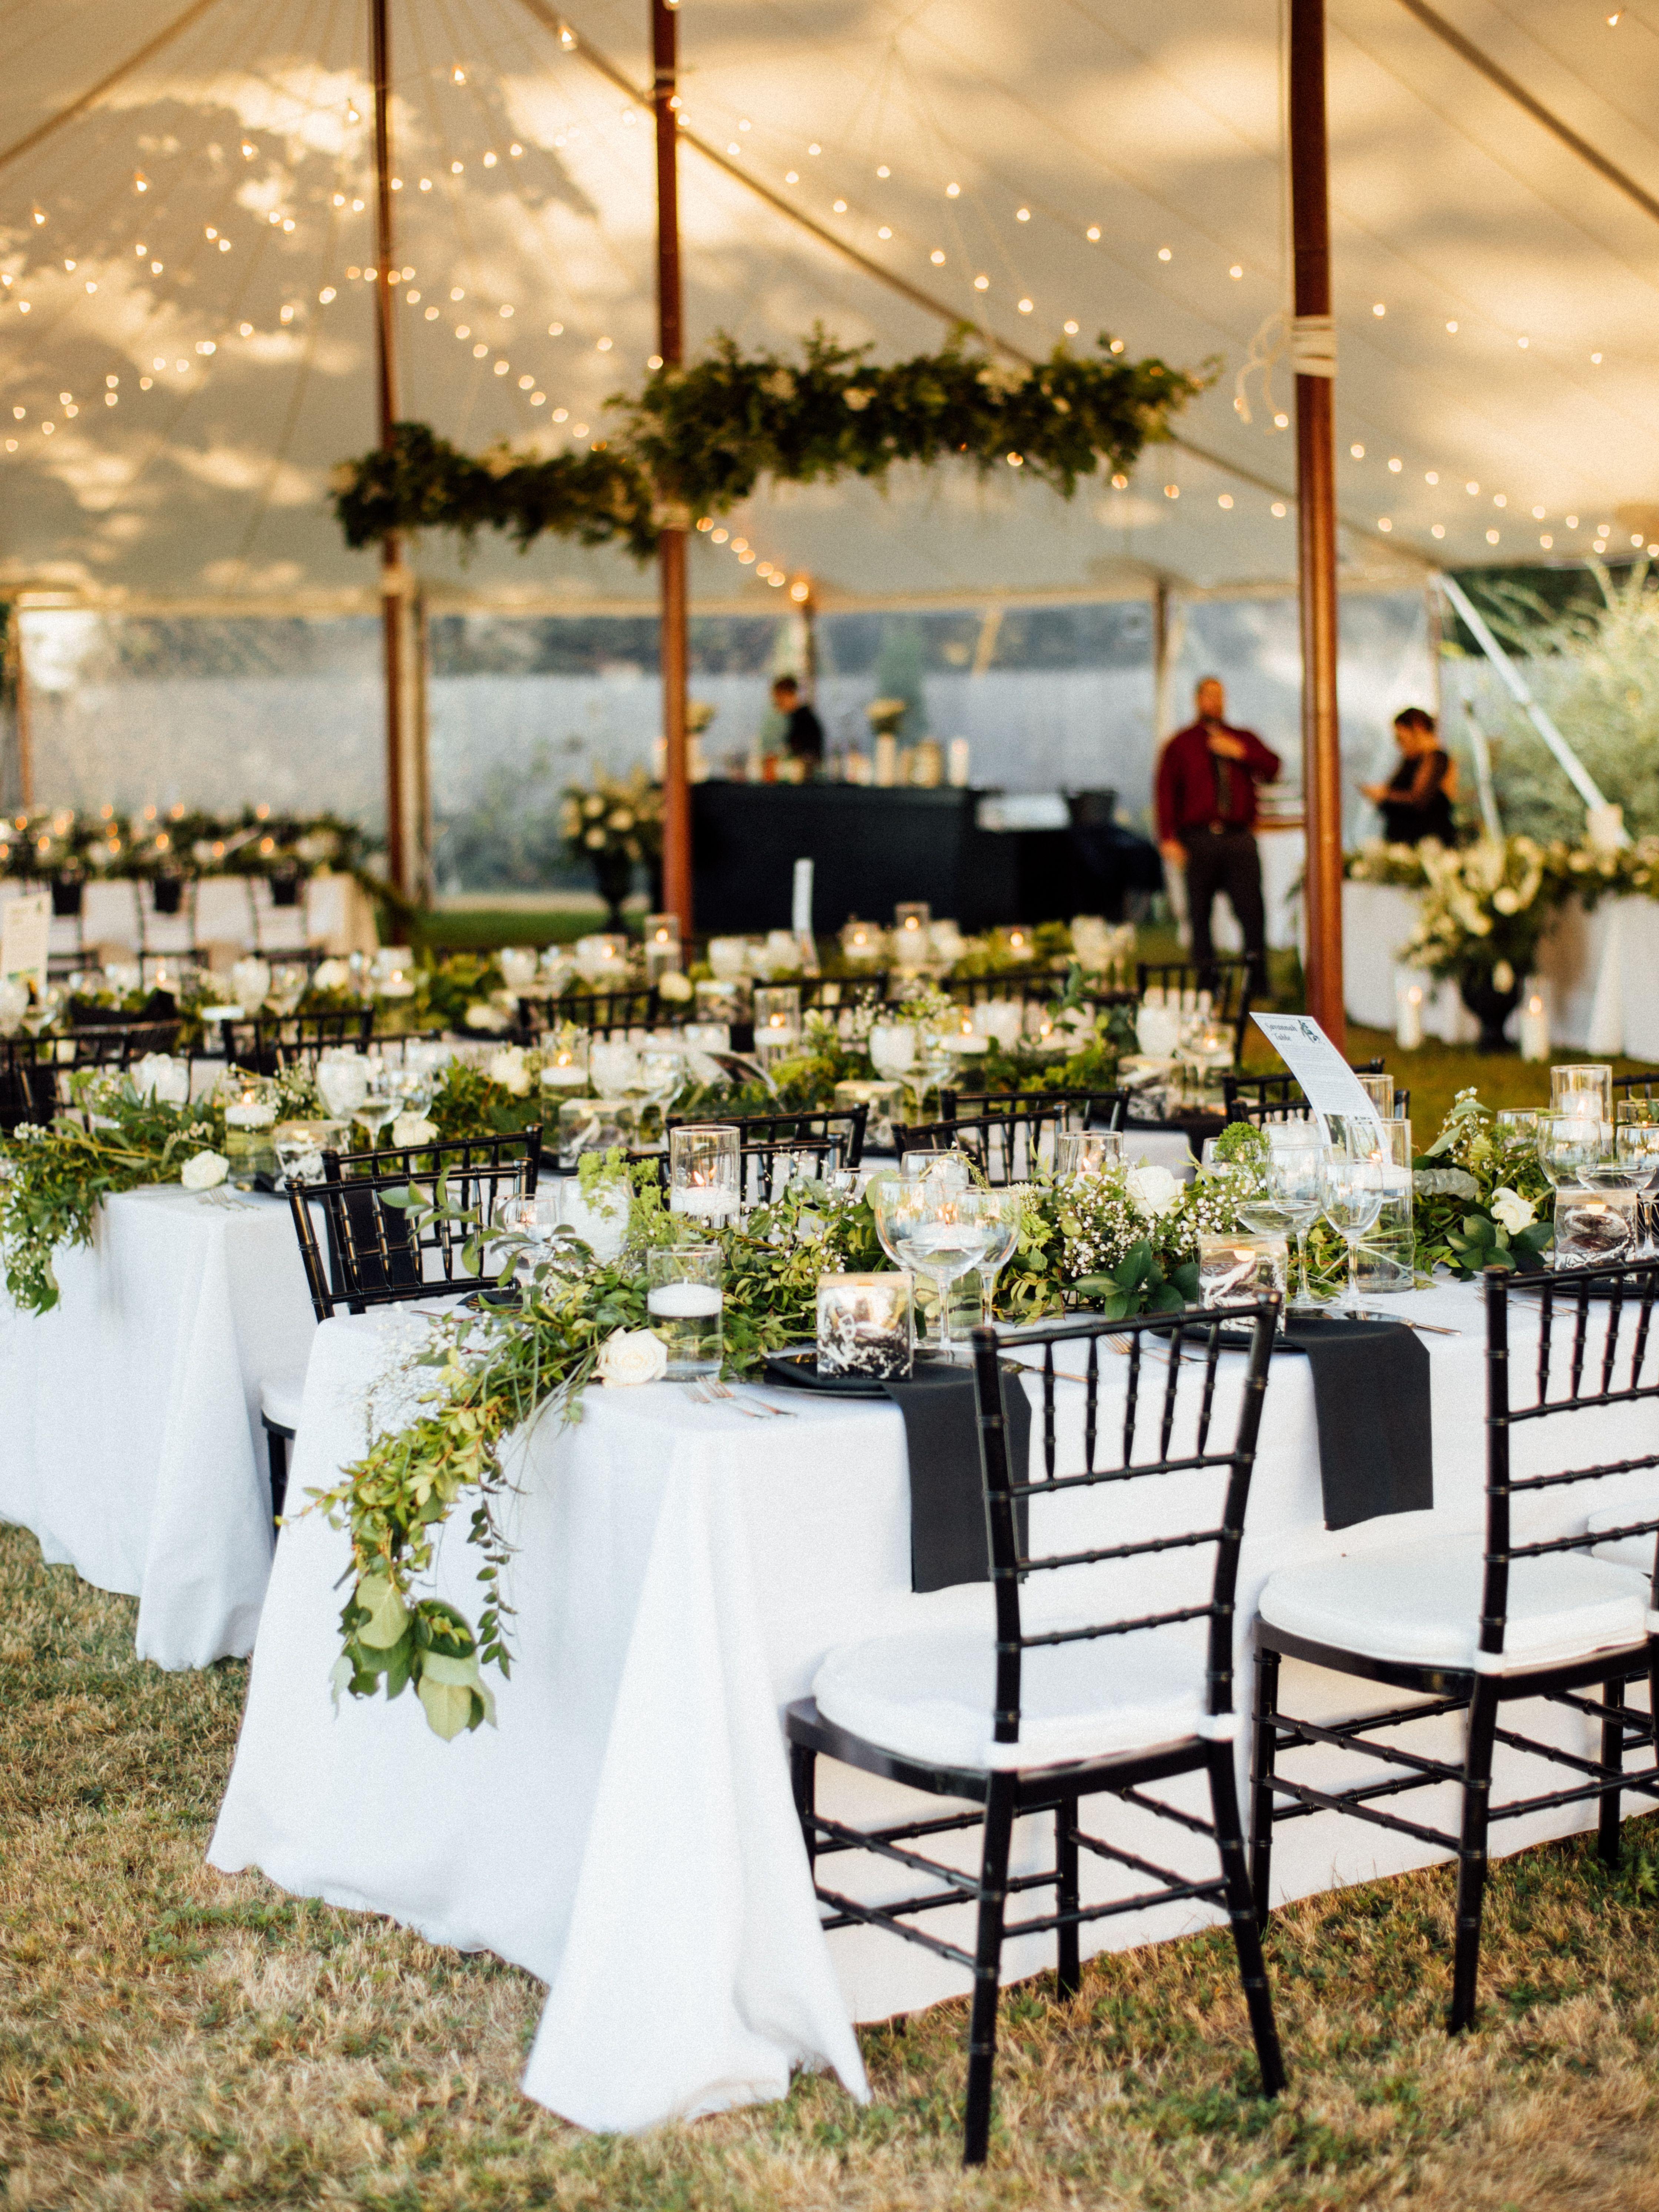 Greenery Outdoor Diy Tent Decor Wedding Chandelier Inspo